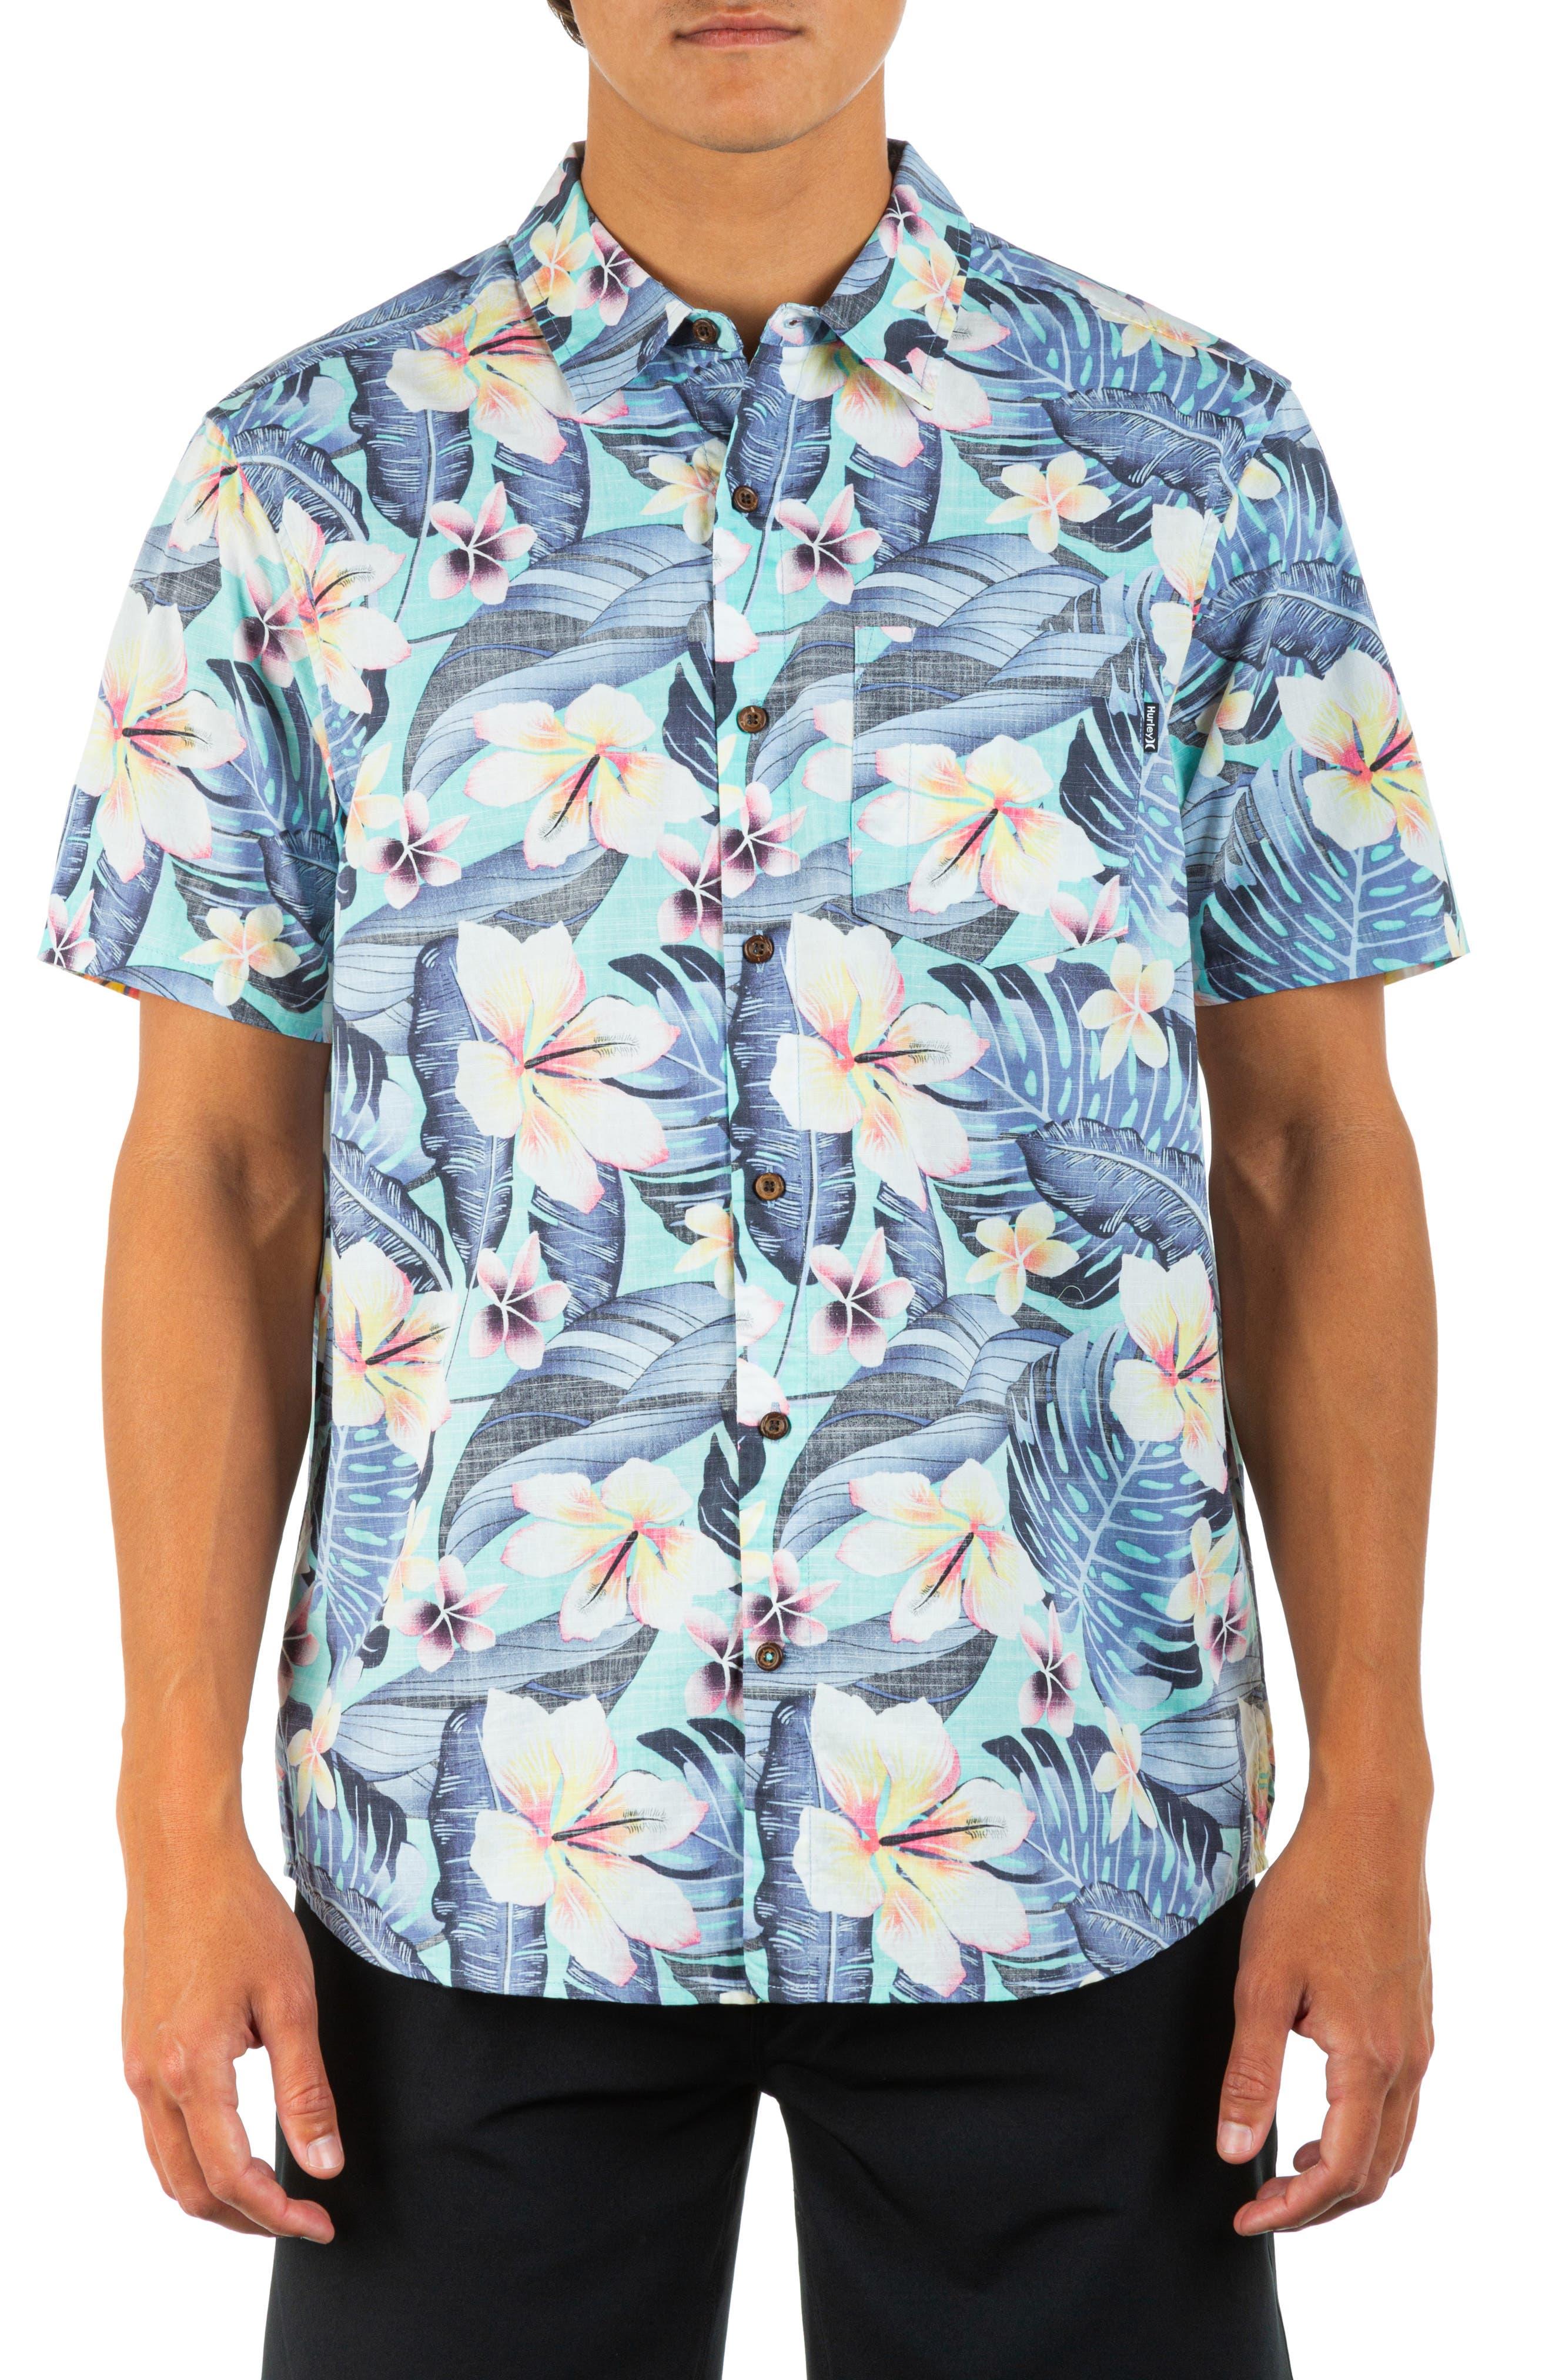 Cabana Floral Short Sleeve Button-Up Organic Cotton Shirt